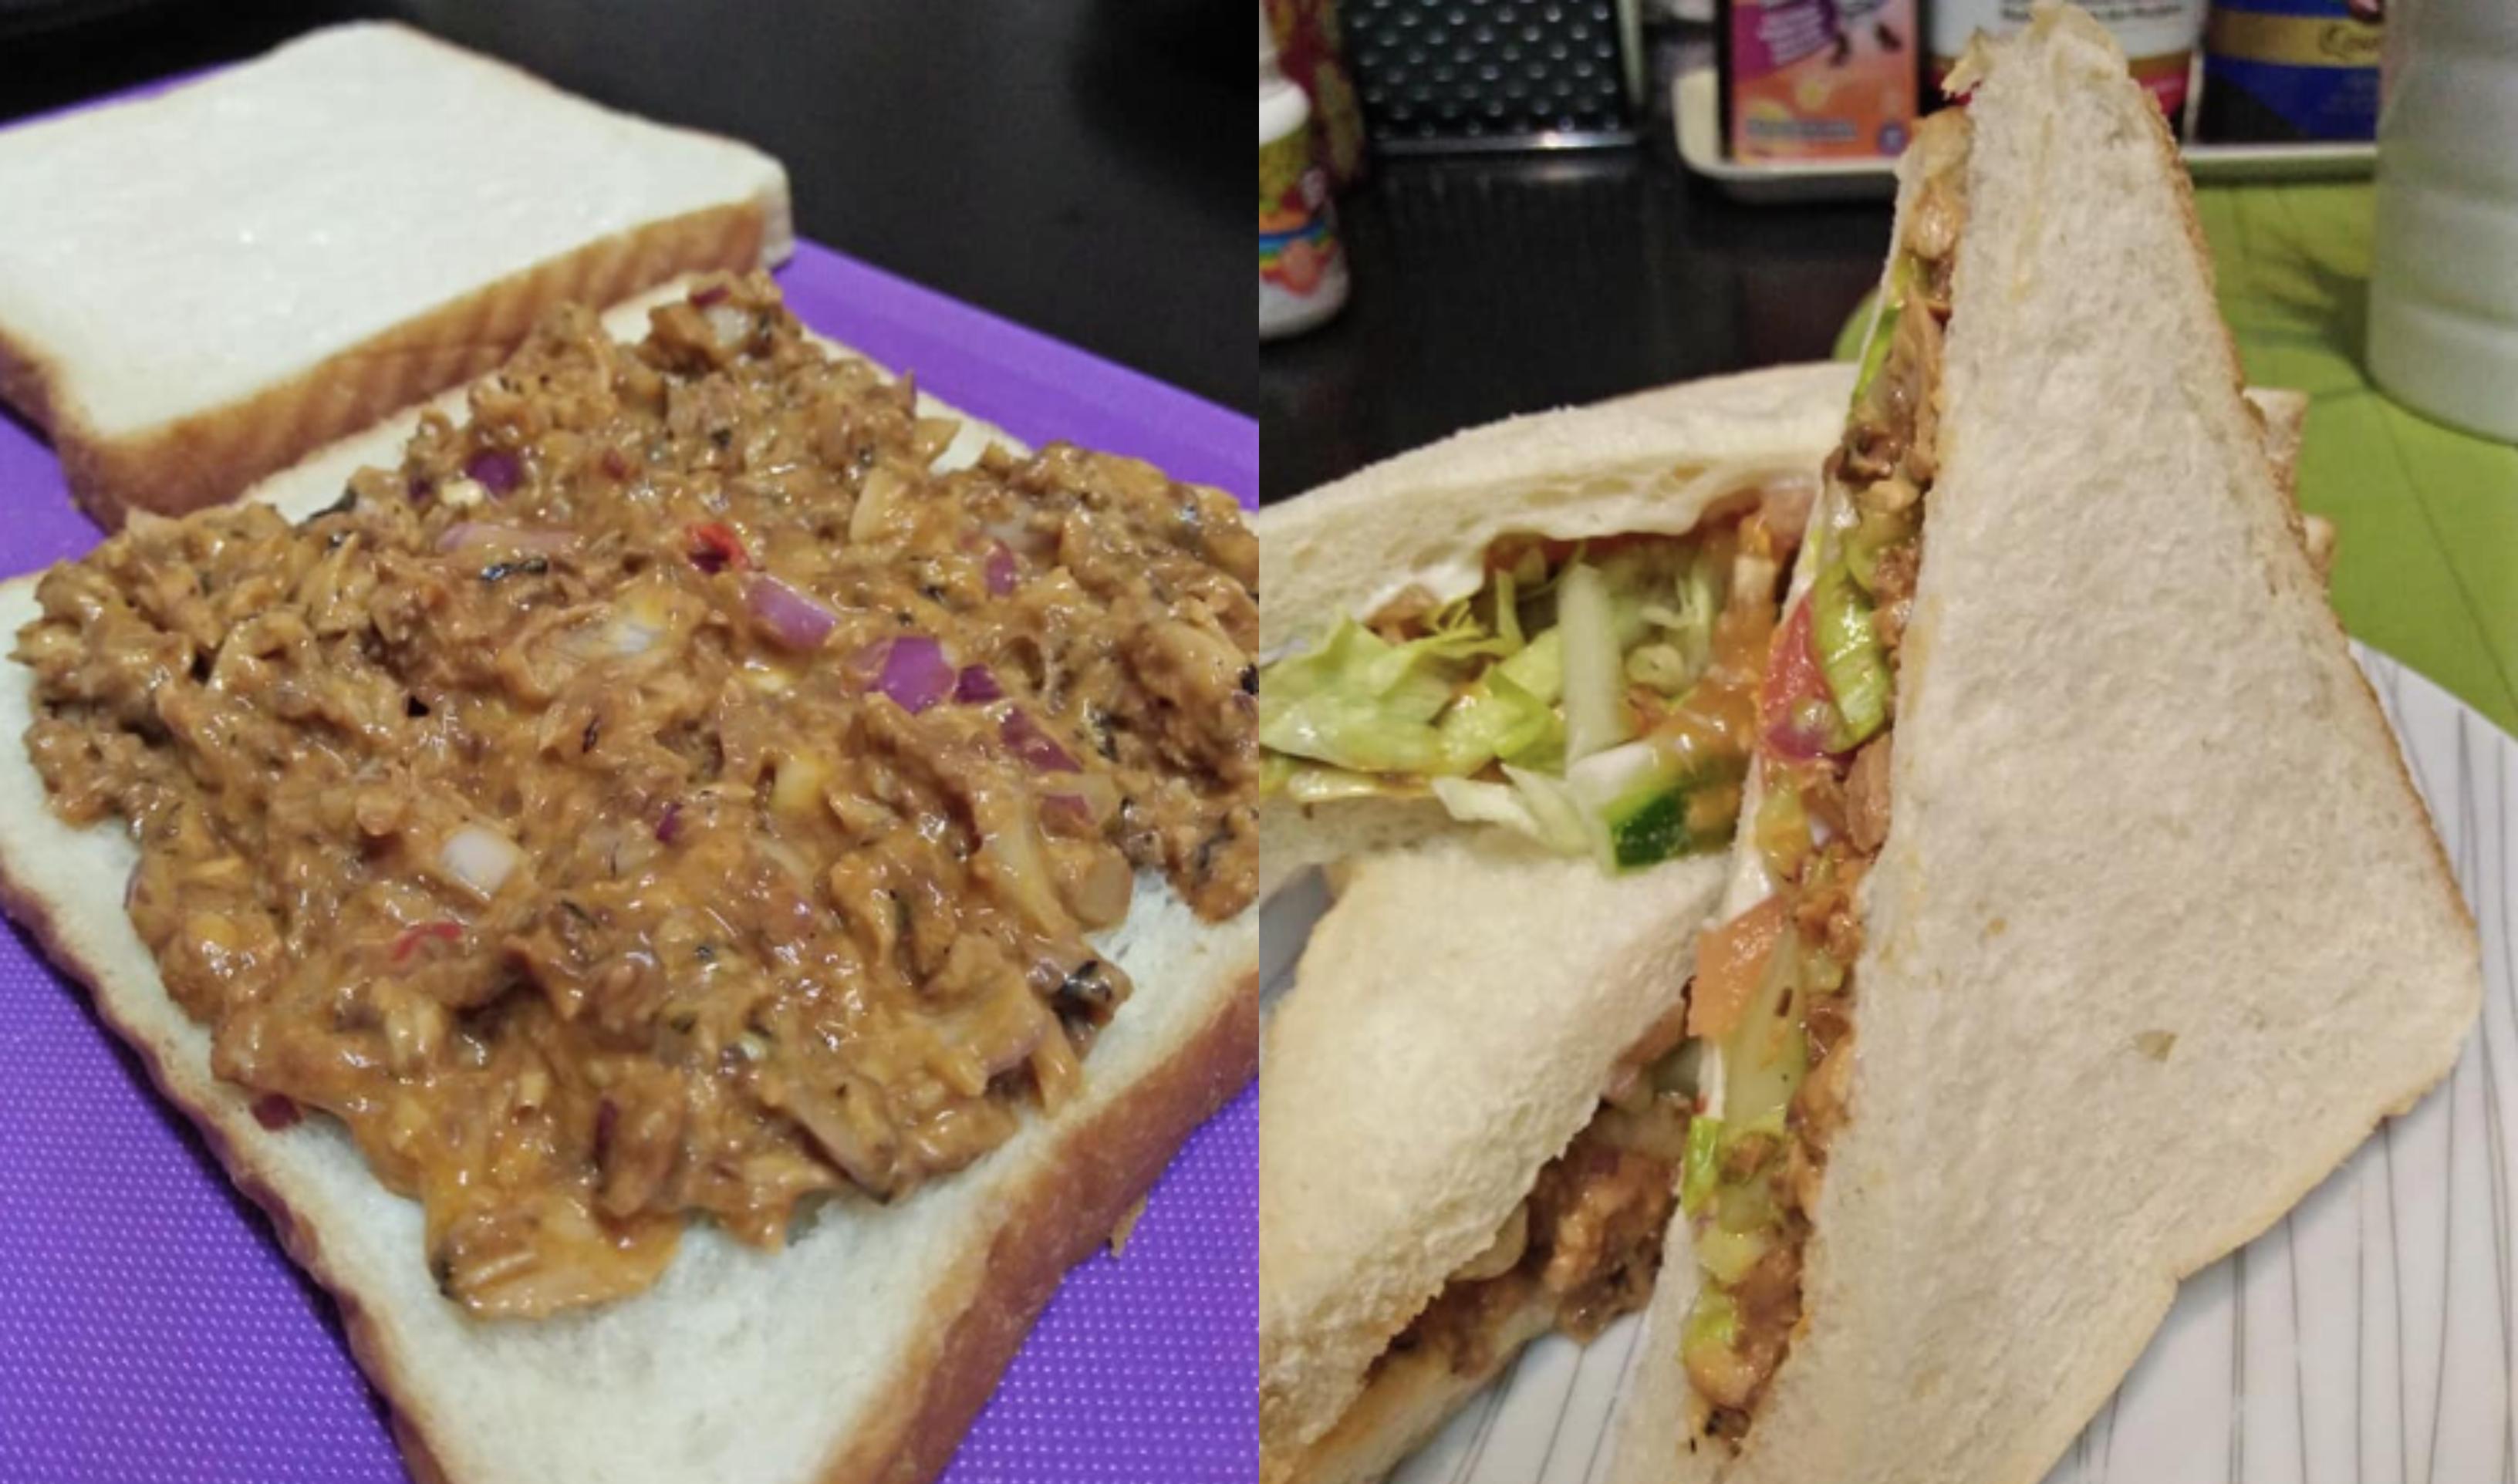 Resipi Sandwich Sardin Sedap Juicy Anak Anak Confirm Suka